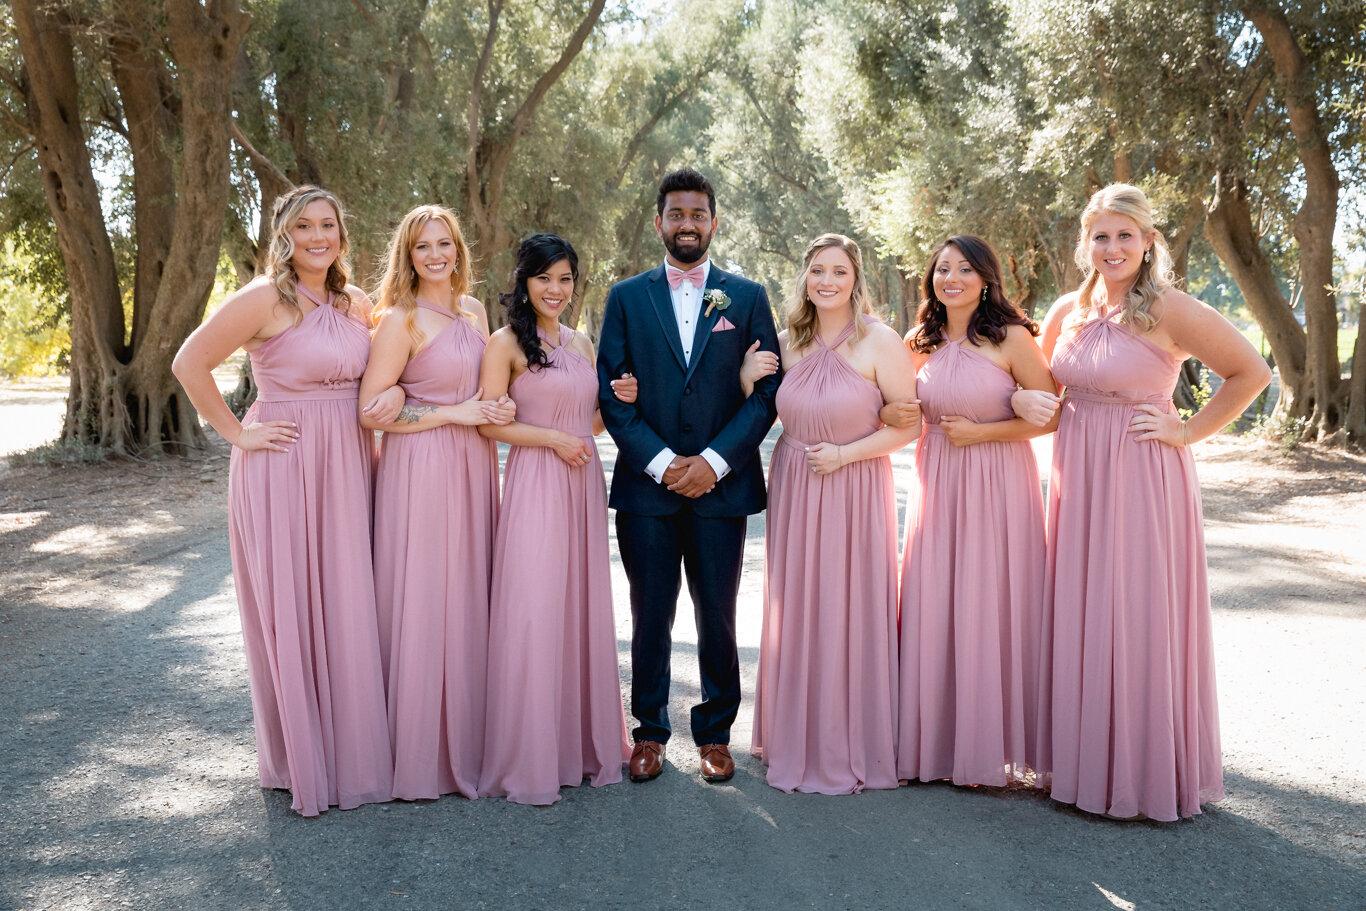 2019.08.24_Emily-Ashir-Wedding-at-the-Maples-5416.jpg